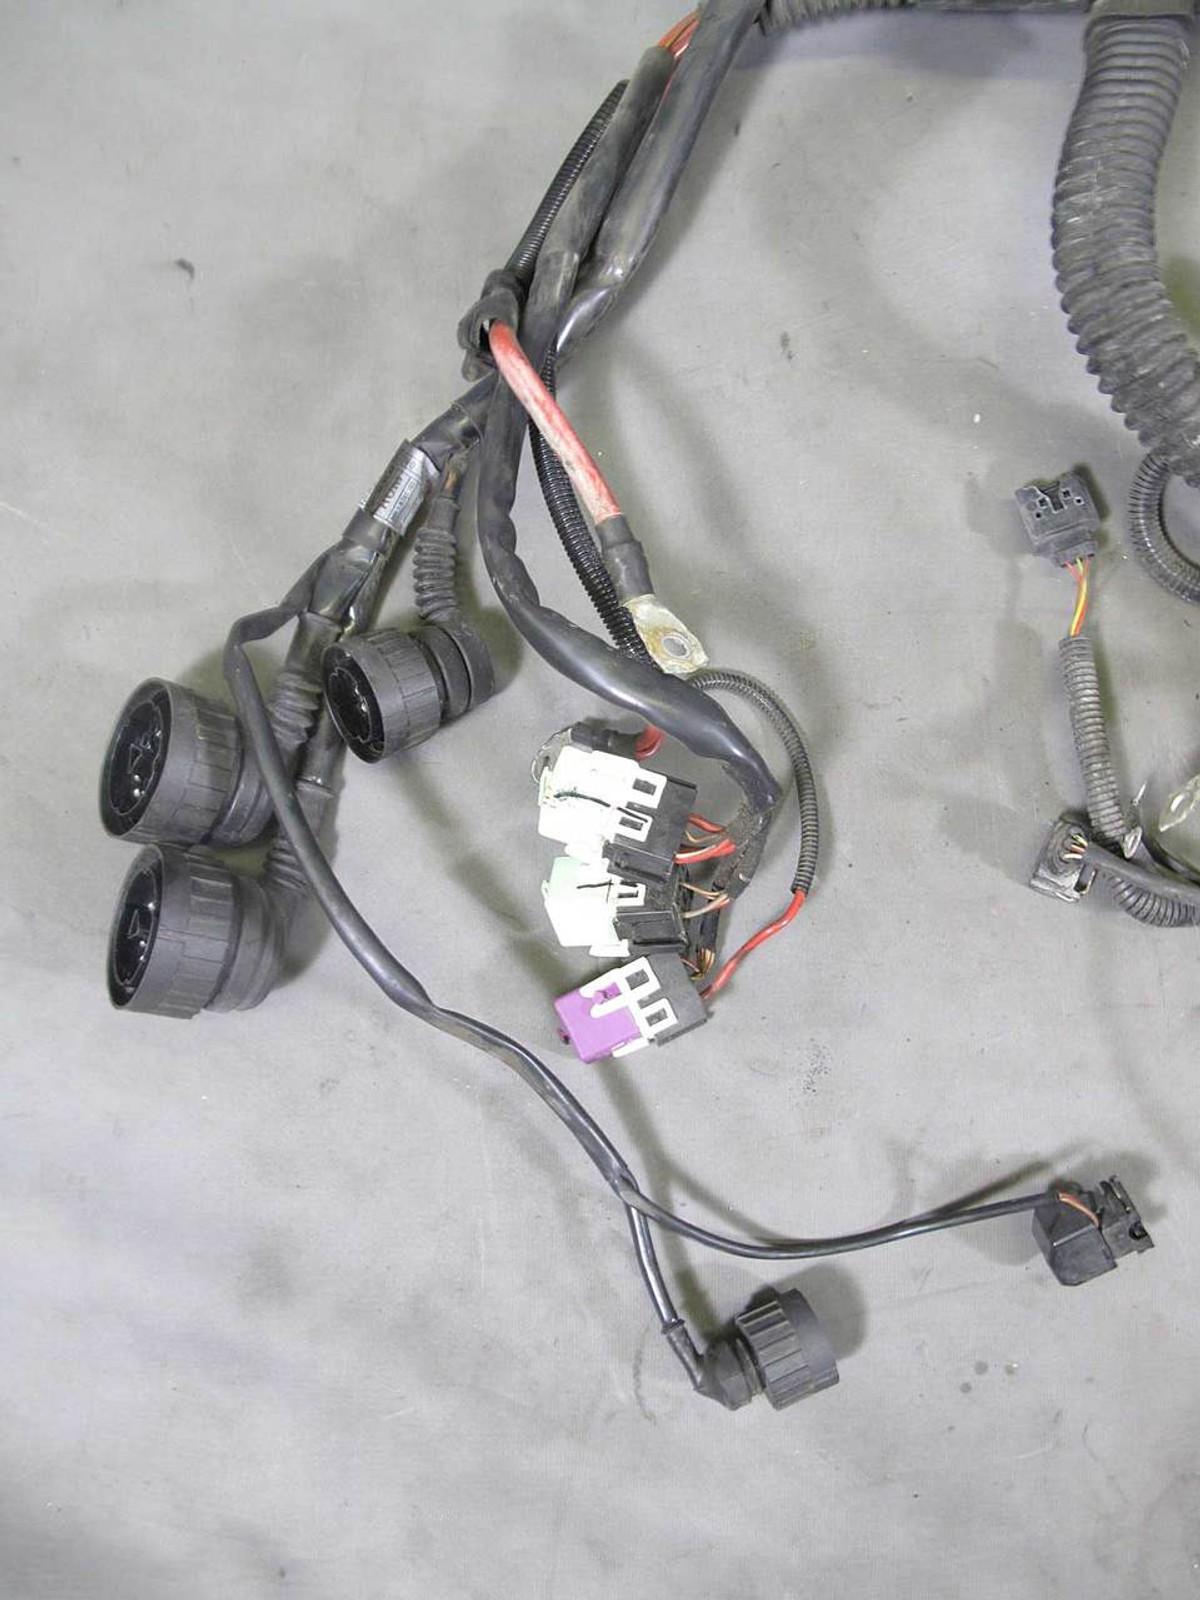 Bmw 328i Wiring Harness - Wiring Diagram Perfomance M Bmw Wiring Harness Diagram on